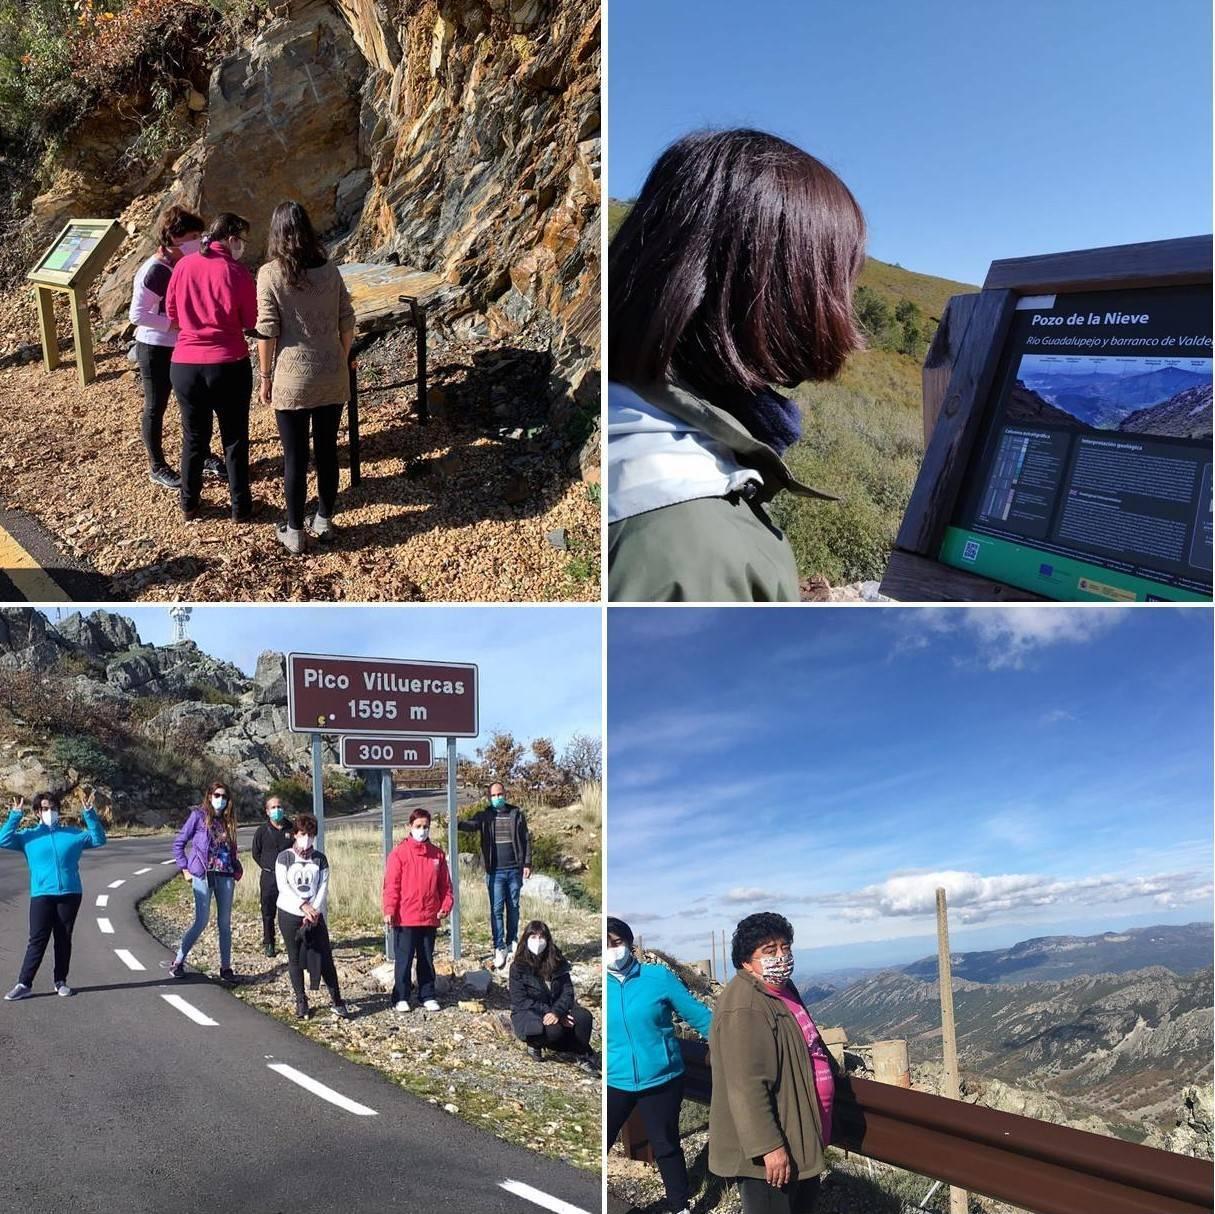 De ruta al Pico Villuercas (2020)